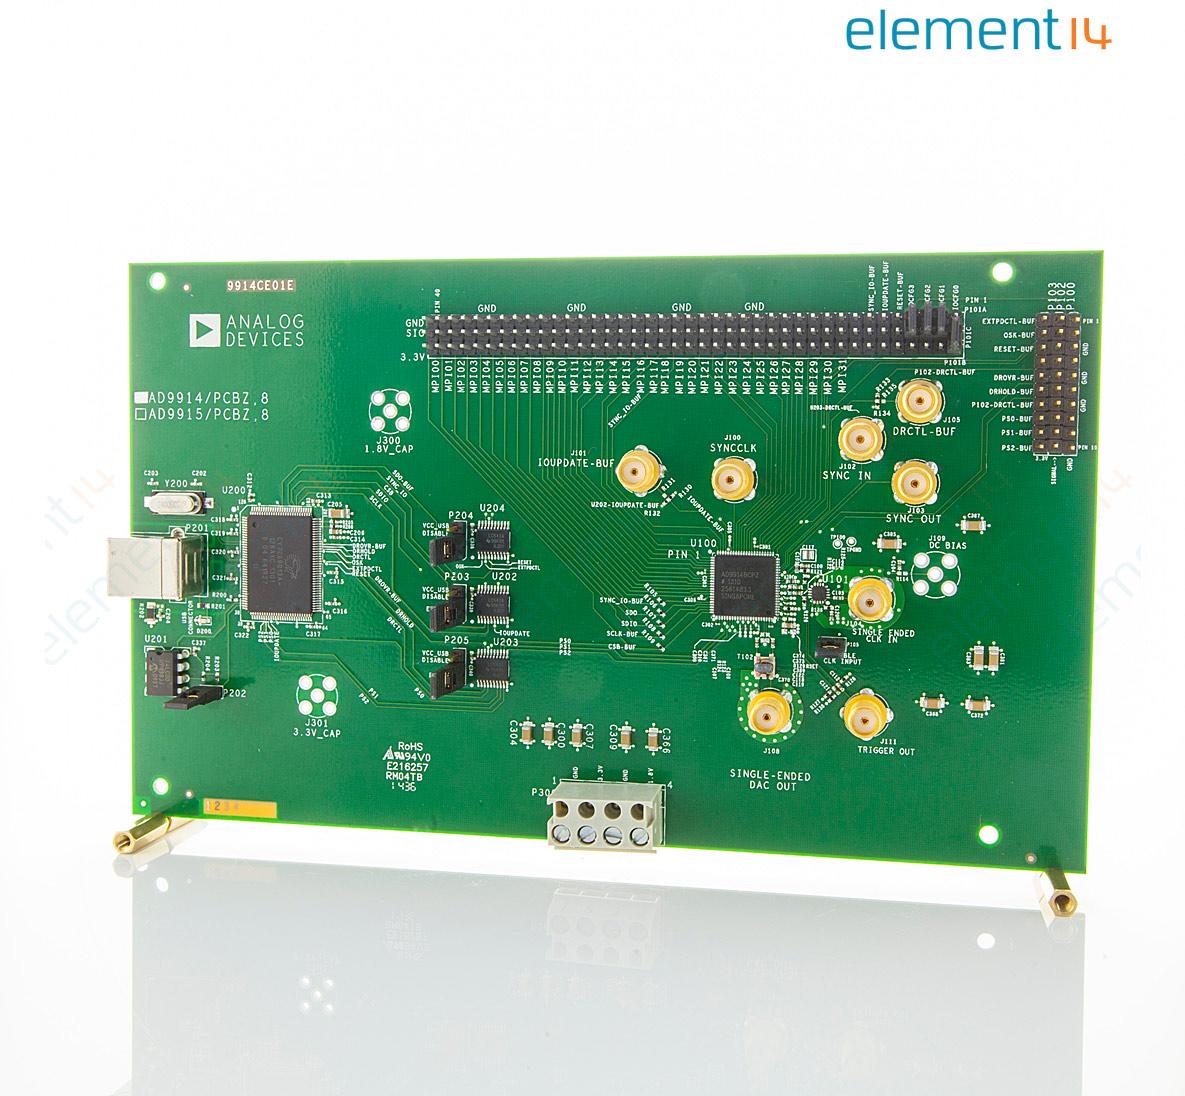 analog devices ad9914/pcbz 评估板, 直接数字合成器, 带上变频器